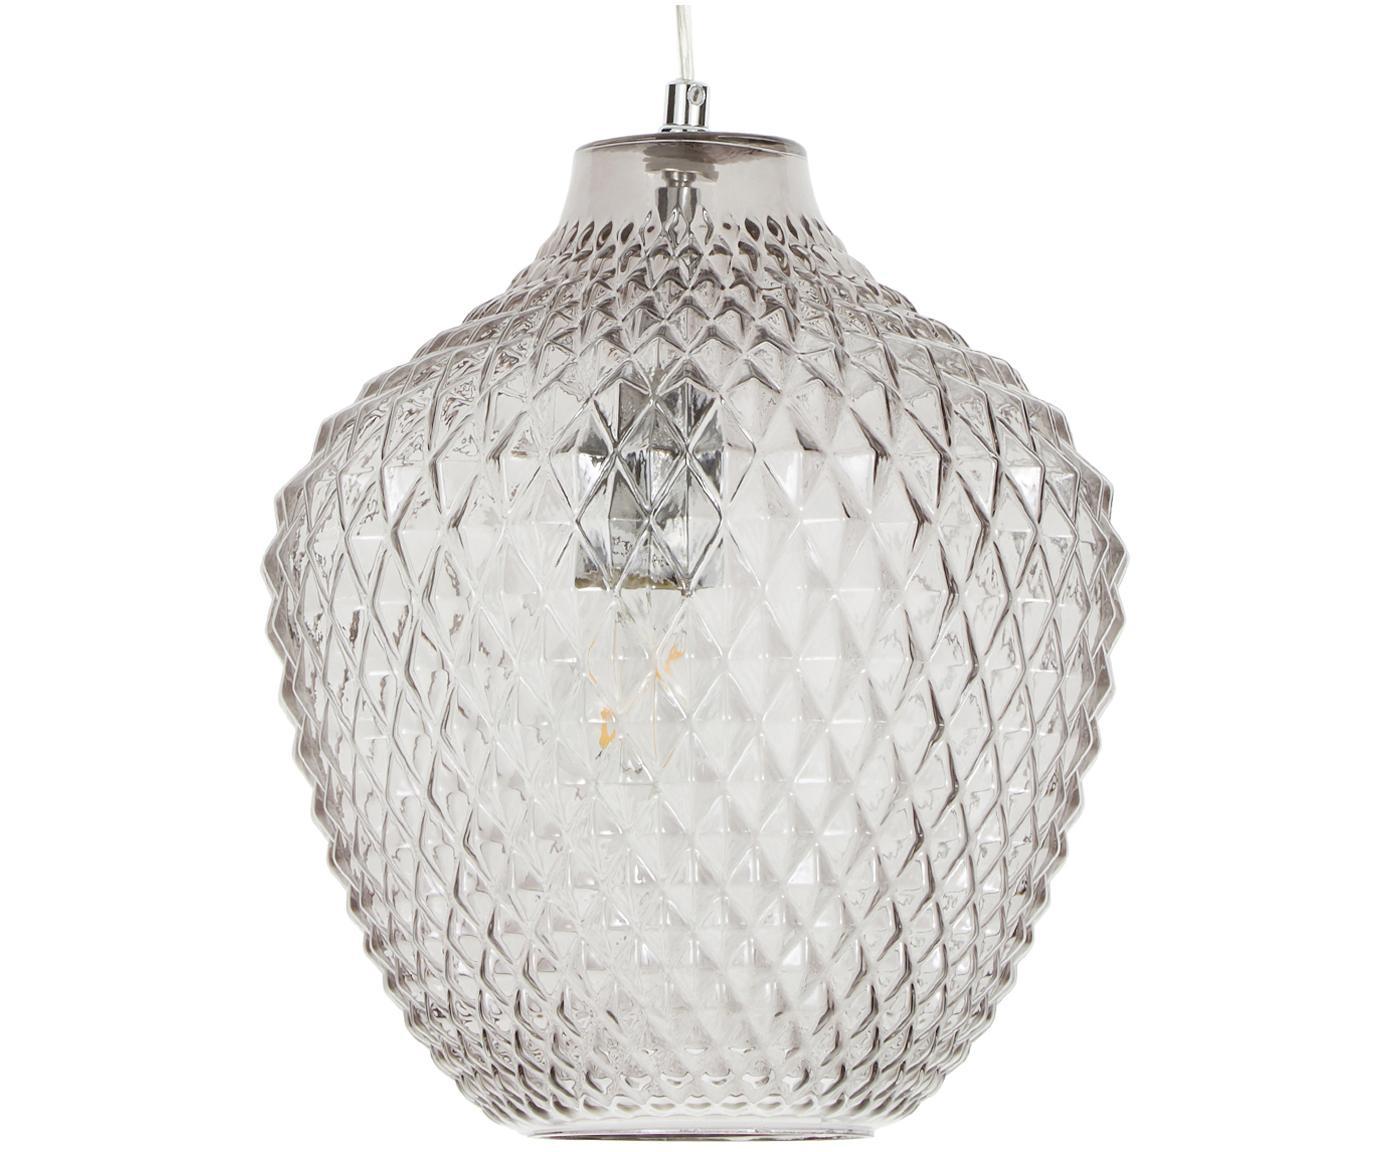 Pendelleuchte Lee aus Glas, Baldachin: Metall, verchromt, Lampenschirm: Glas, Grau, transparent, Chrom, ∅ 27 x H 33 cm